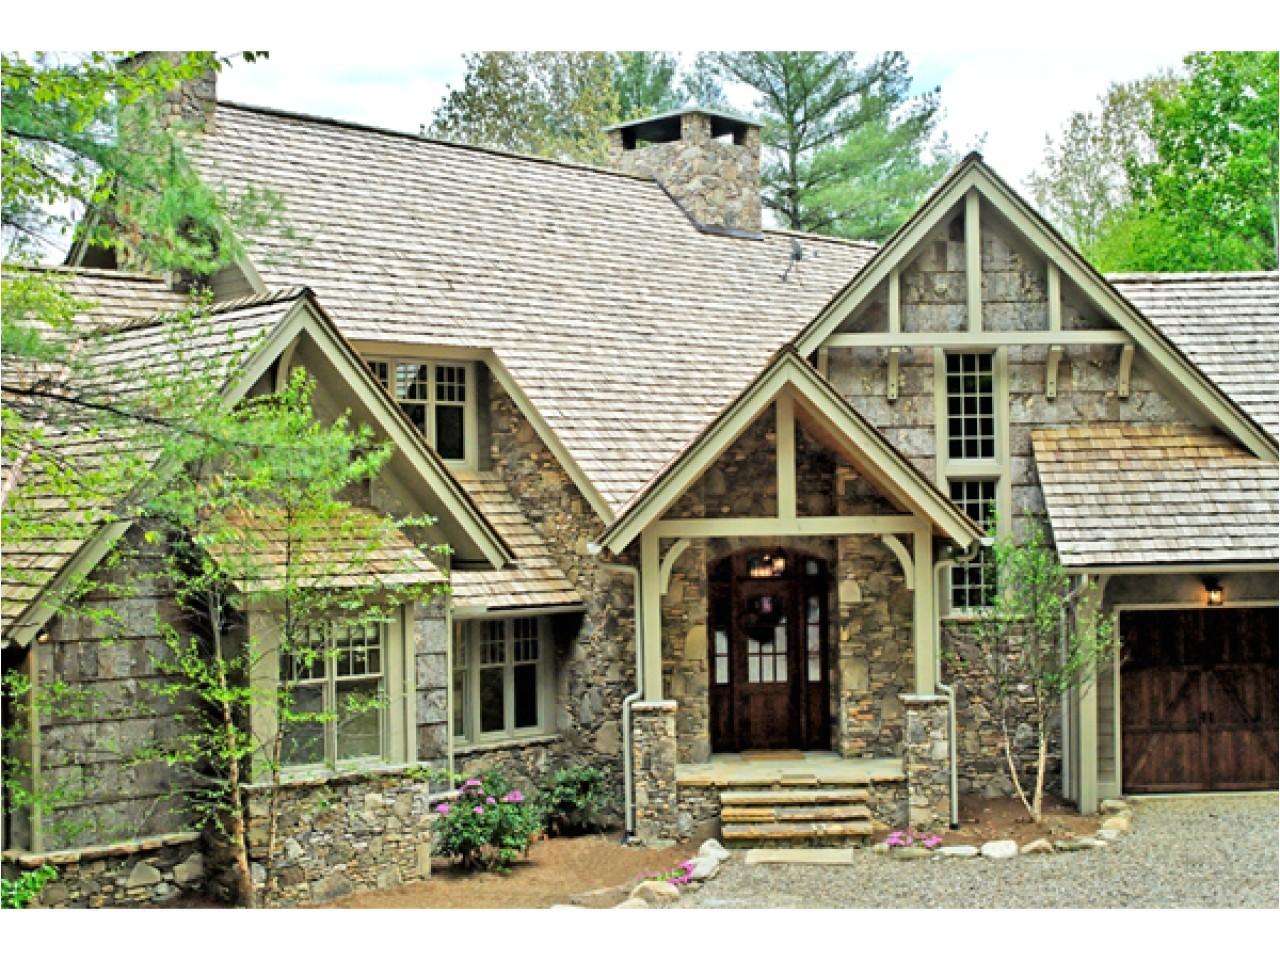 3d9ede5d481fb9f8 house plans rustic homes country cottage house plans